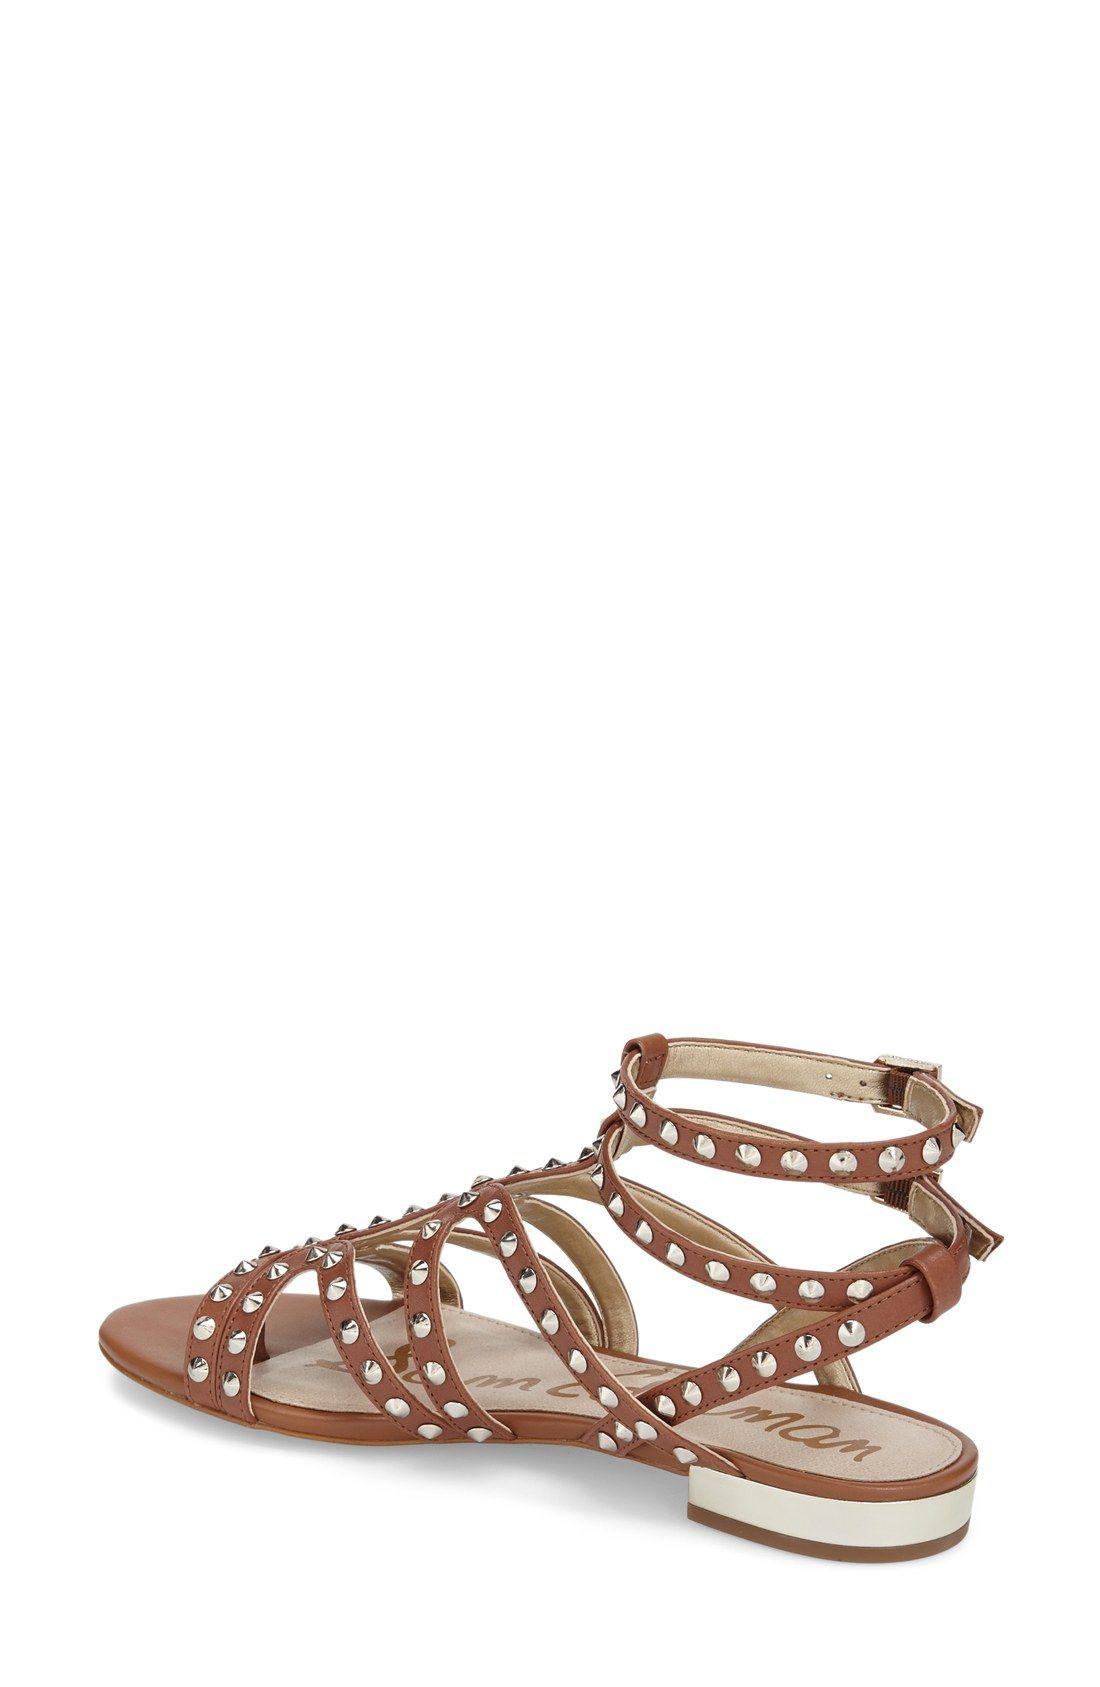 Sam Edelman Demi Studded Flat Sandal Women Sandals Flat Sandals Nordstrom